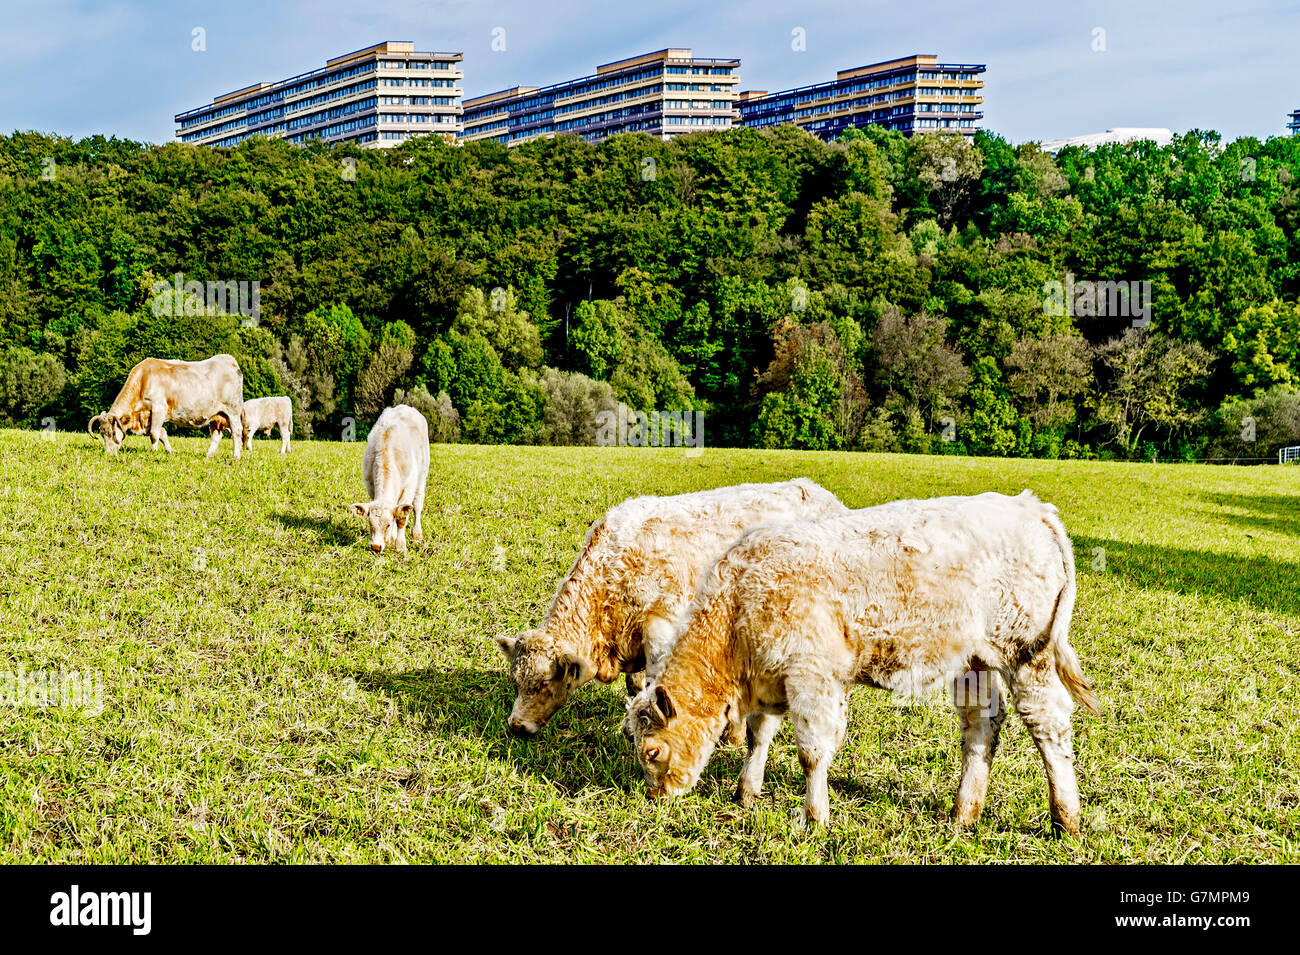 View at the University in Bochum, ruhr area, Germany; Blick auf die Ruhr Universitaet Bochum, vom Süden her Stock Photo